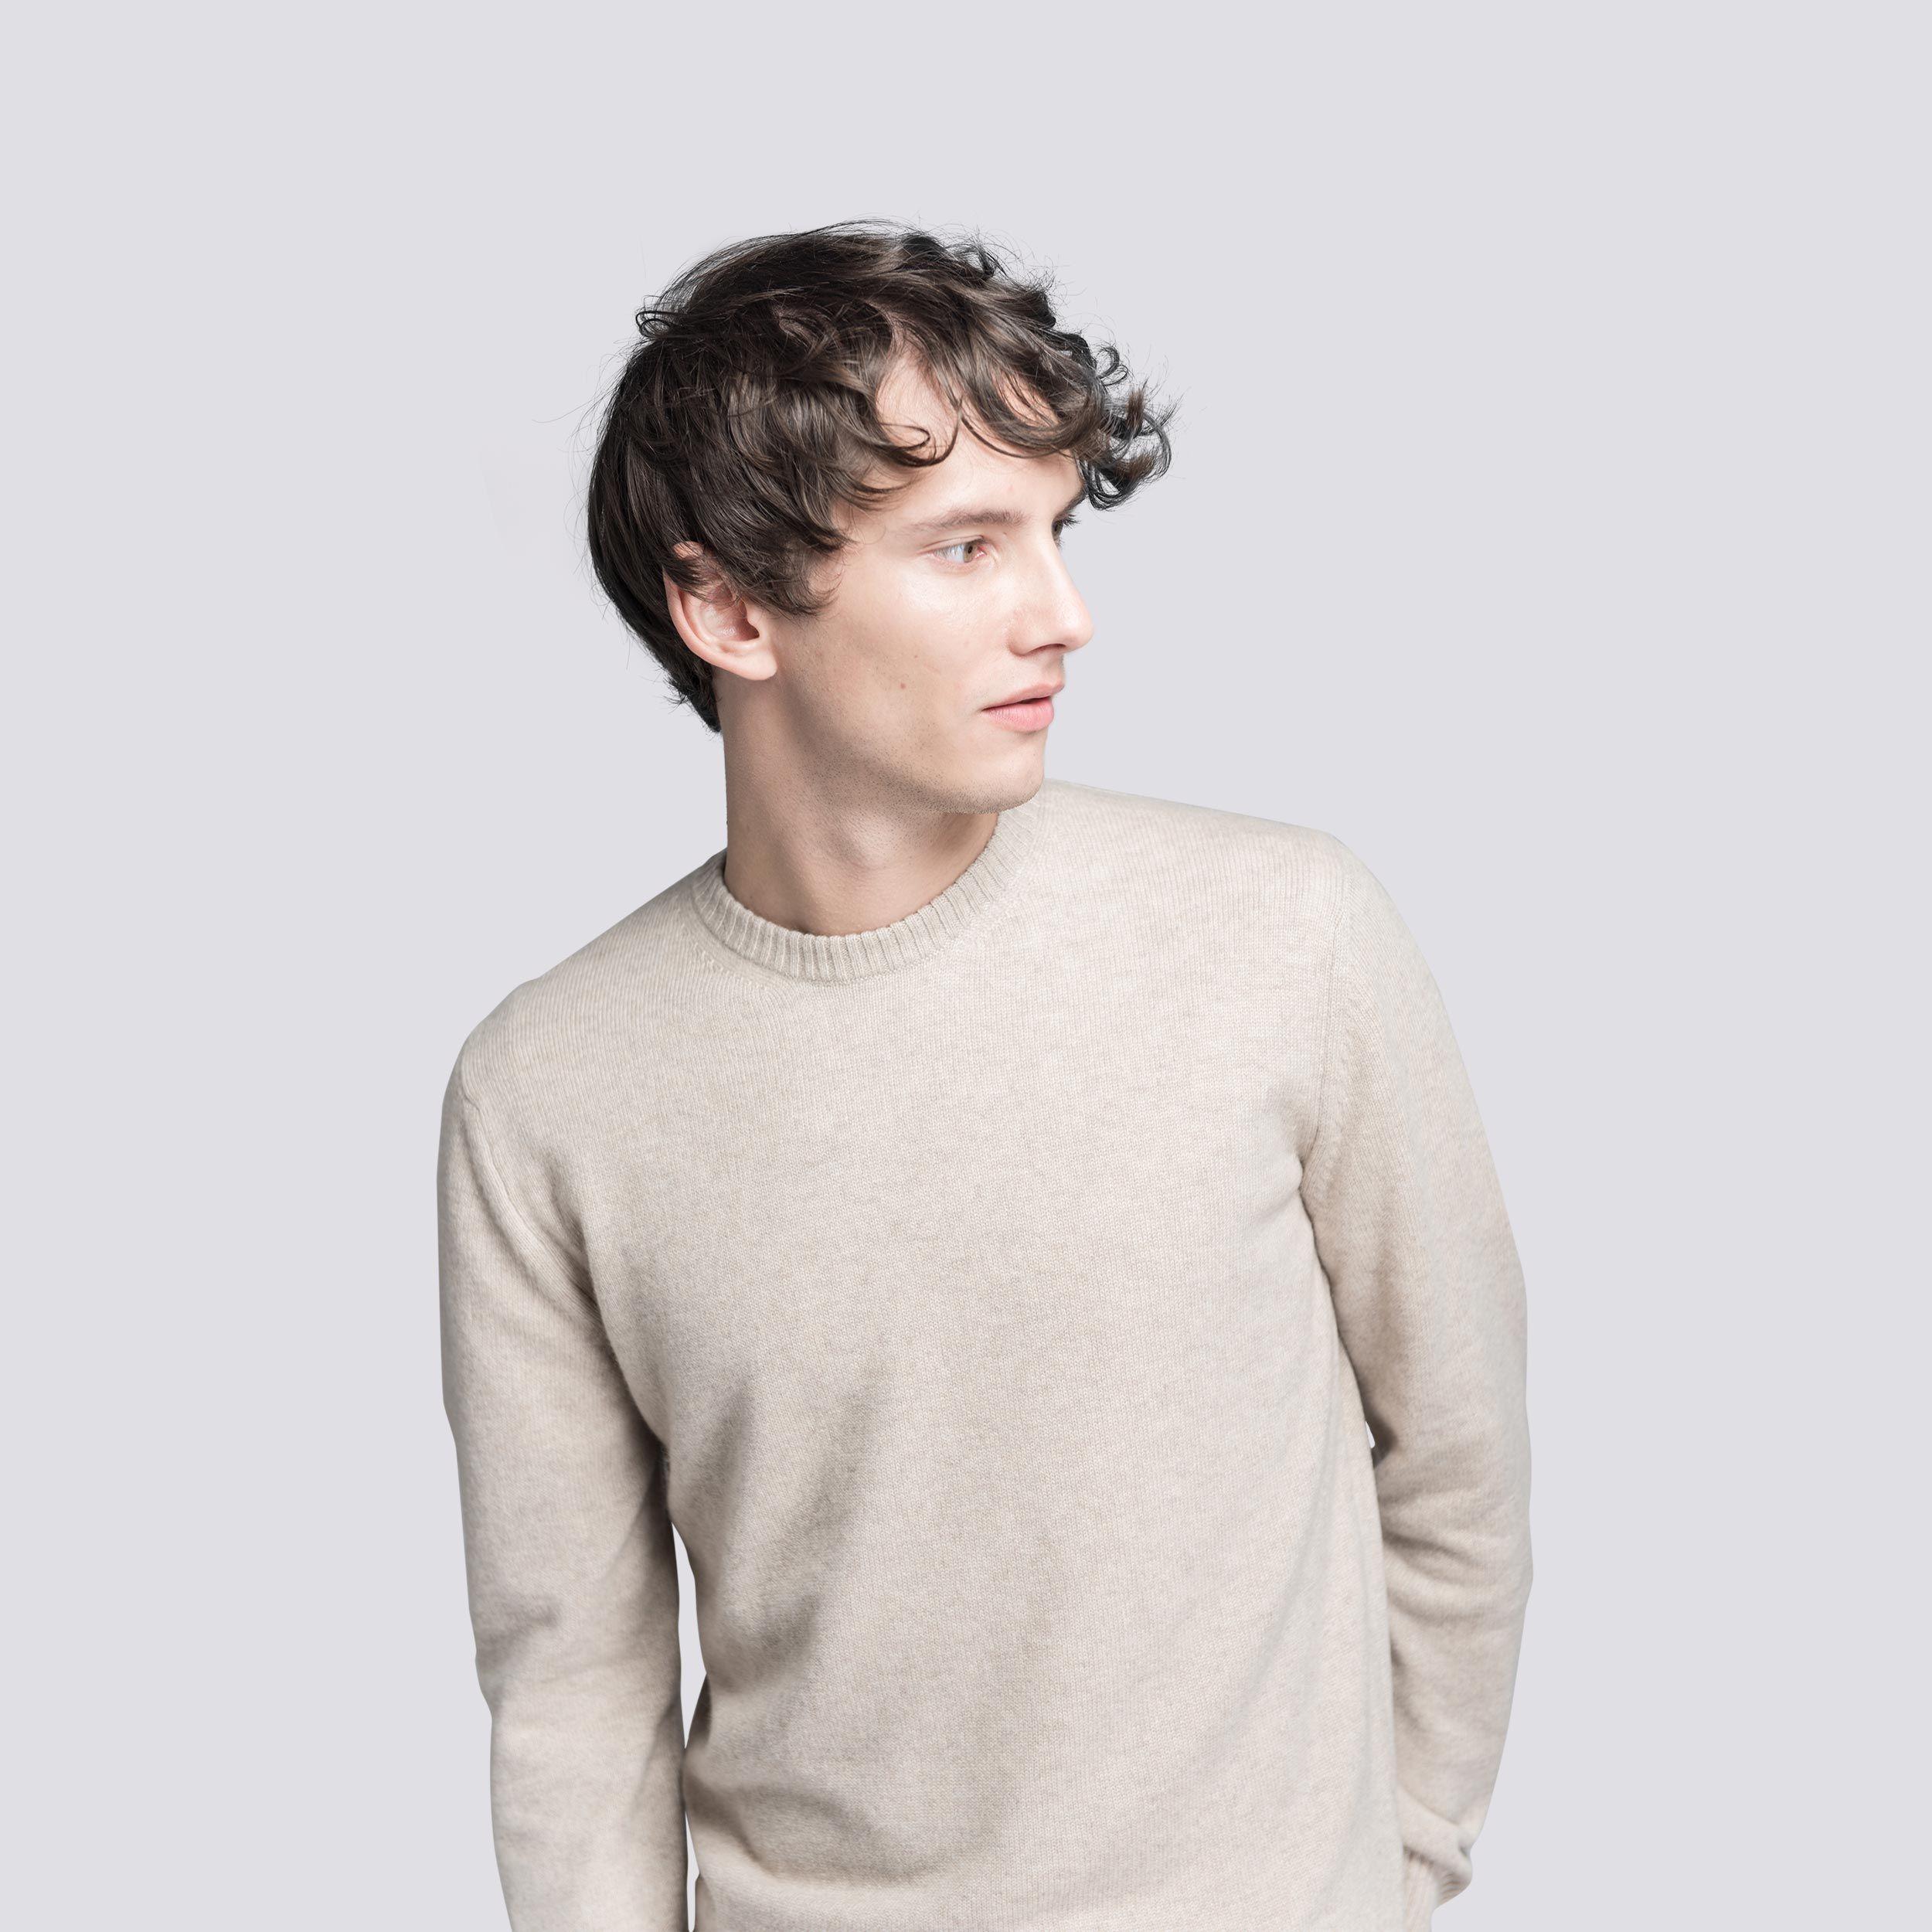 Asket 3 Ply Cashmere Sweater Cashmere Sweaters Long Sleeve Tshirt Men Knitwear Men [ 2500 x 2500 Pixel ]